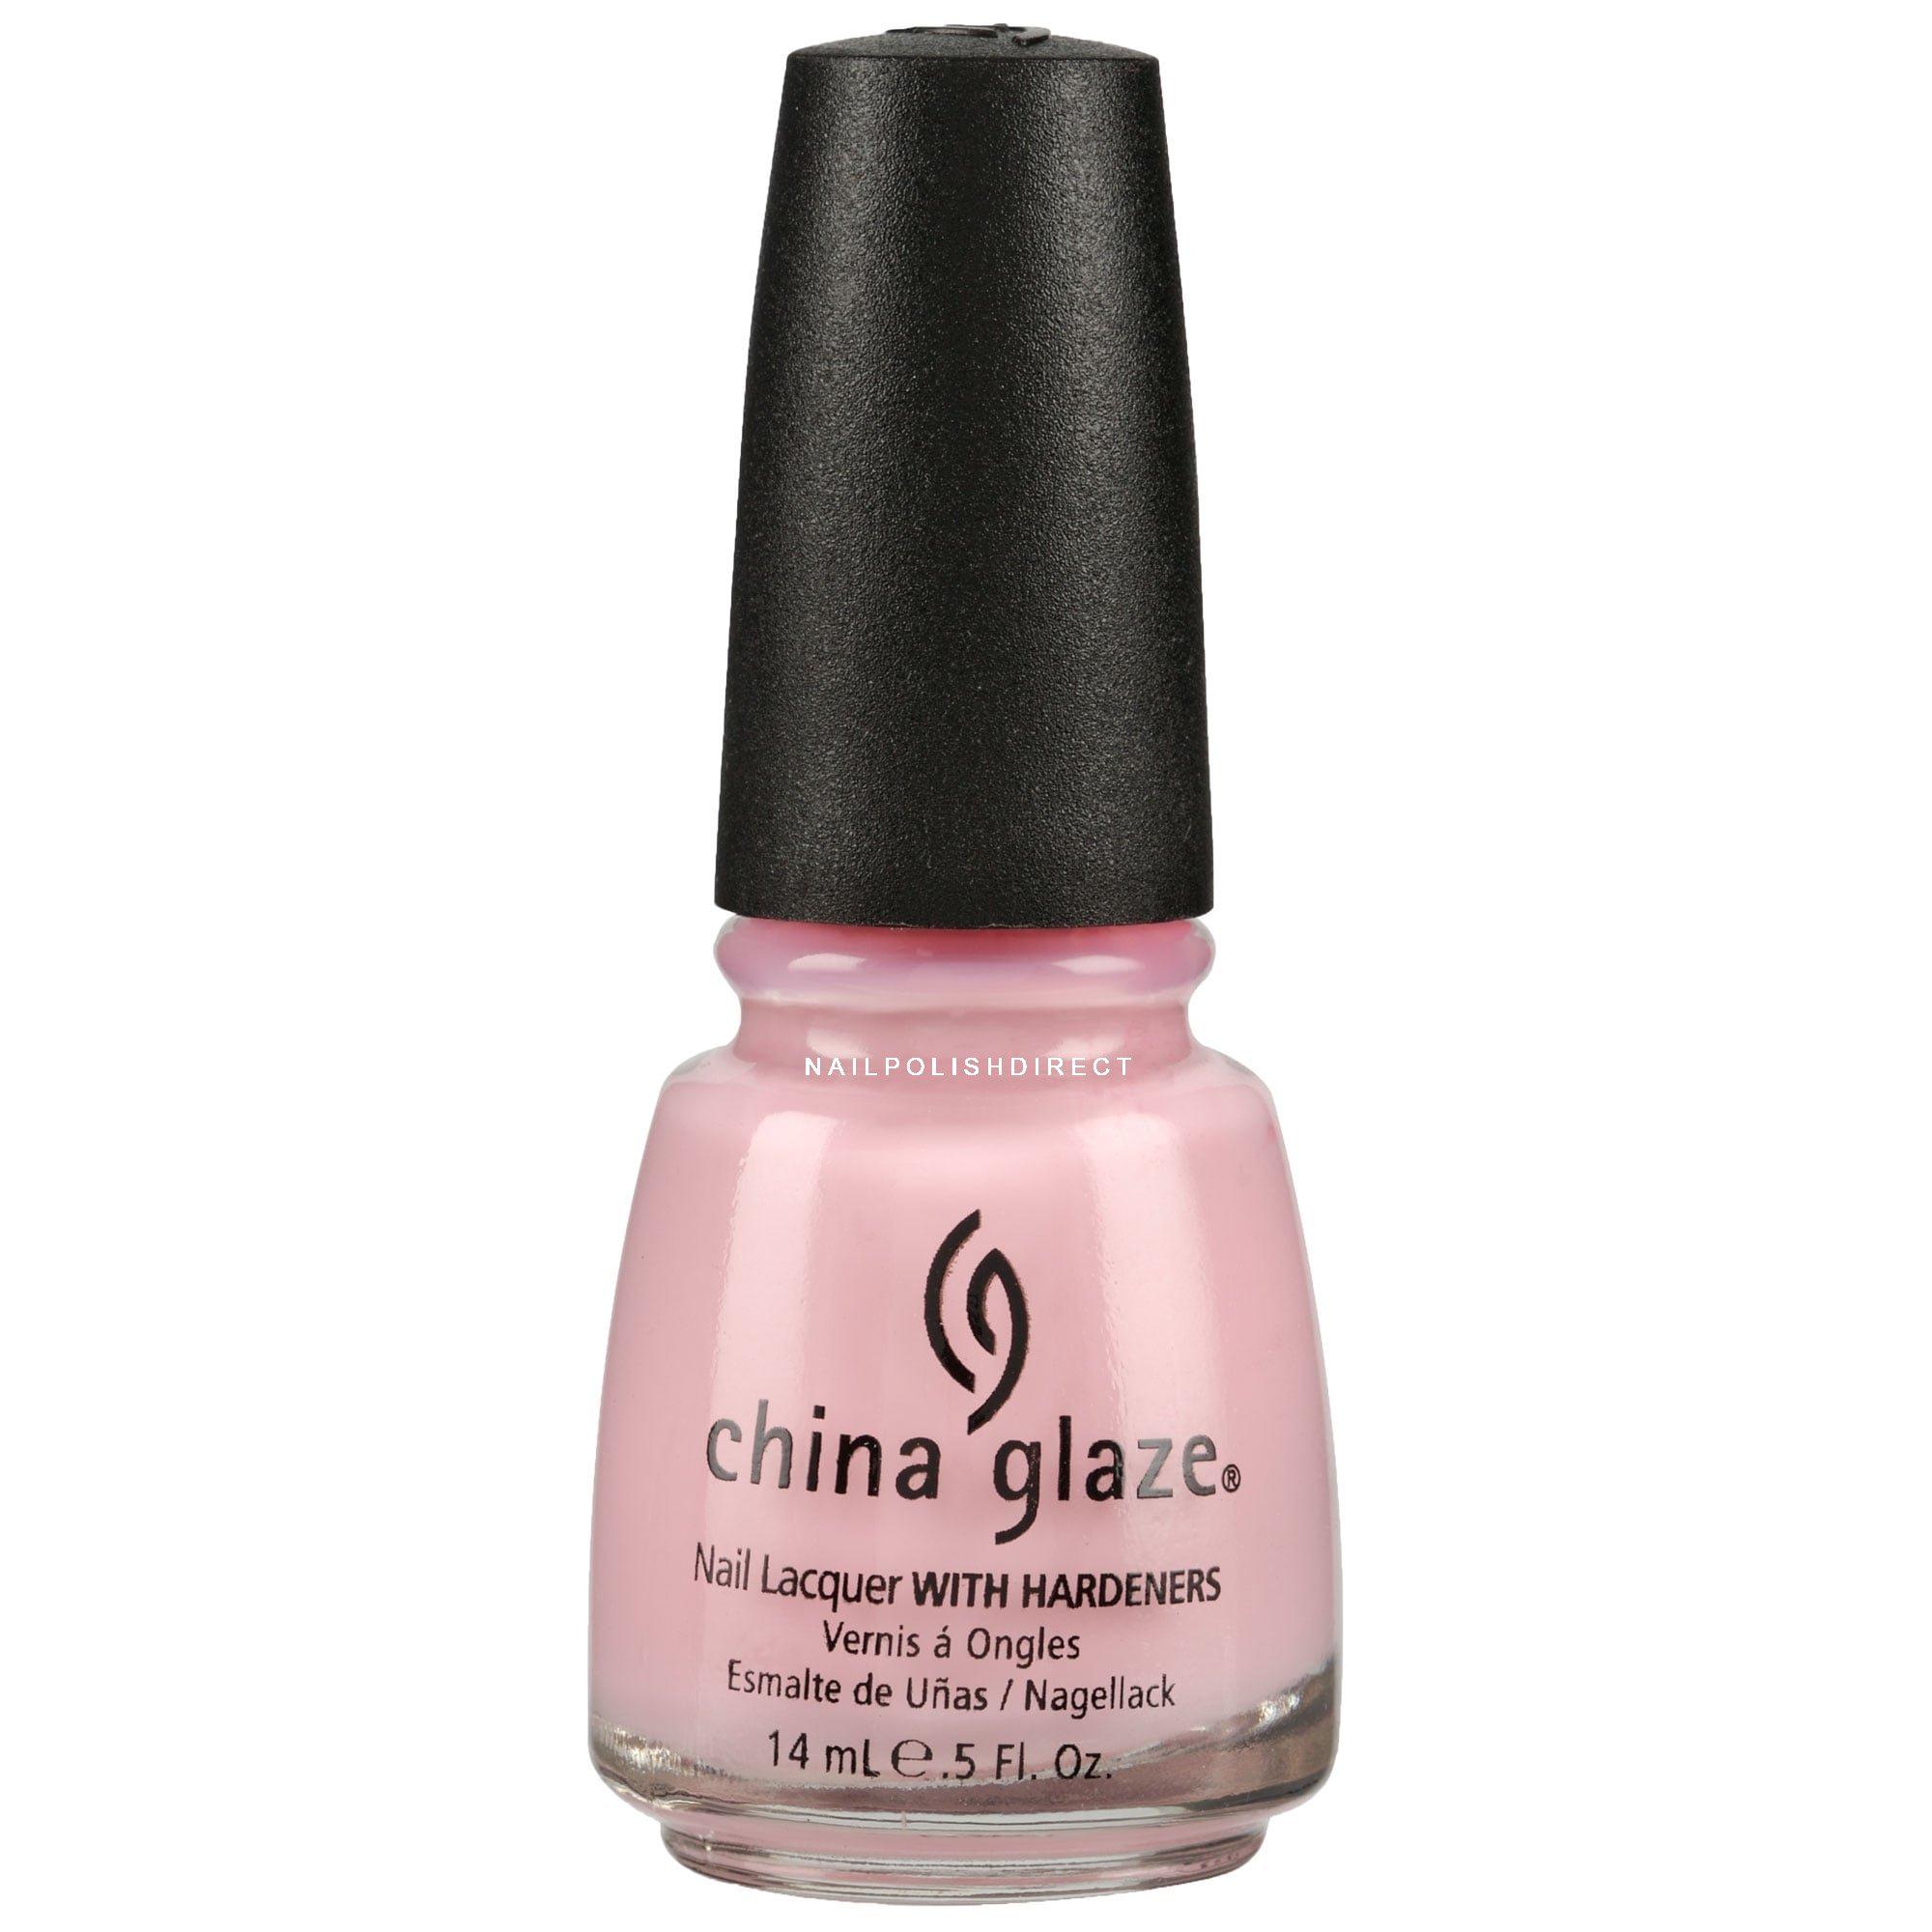 China Glaze Red Nail Polish: China Glaze Up & Away Nail Polish Collection 2010